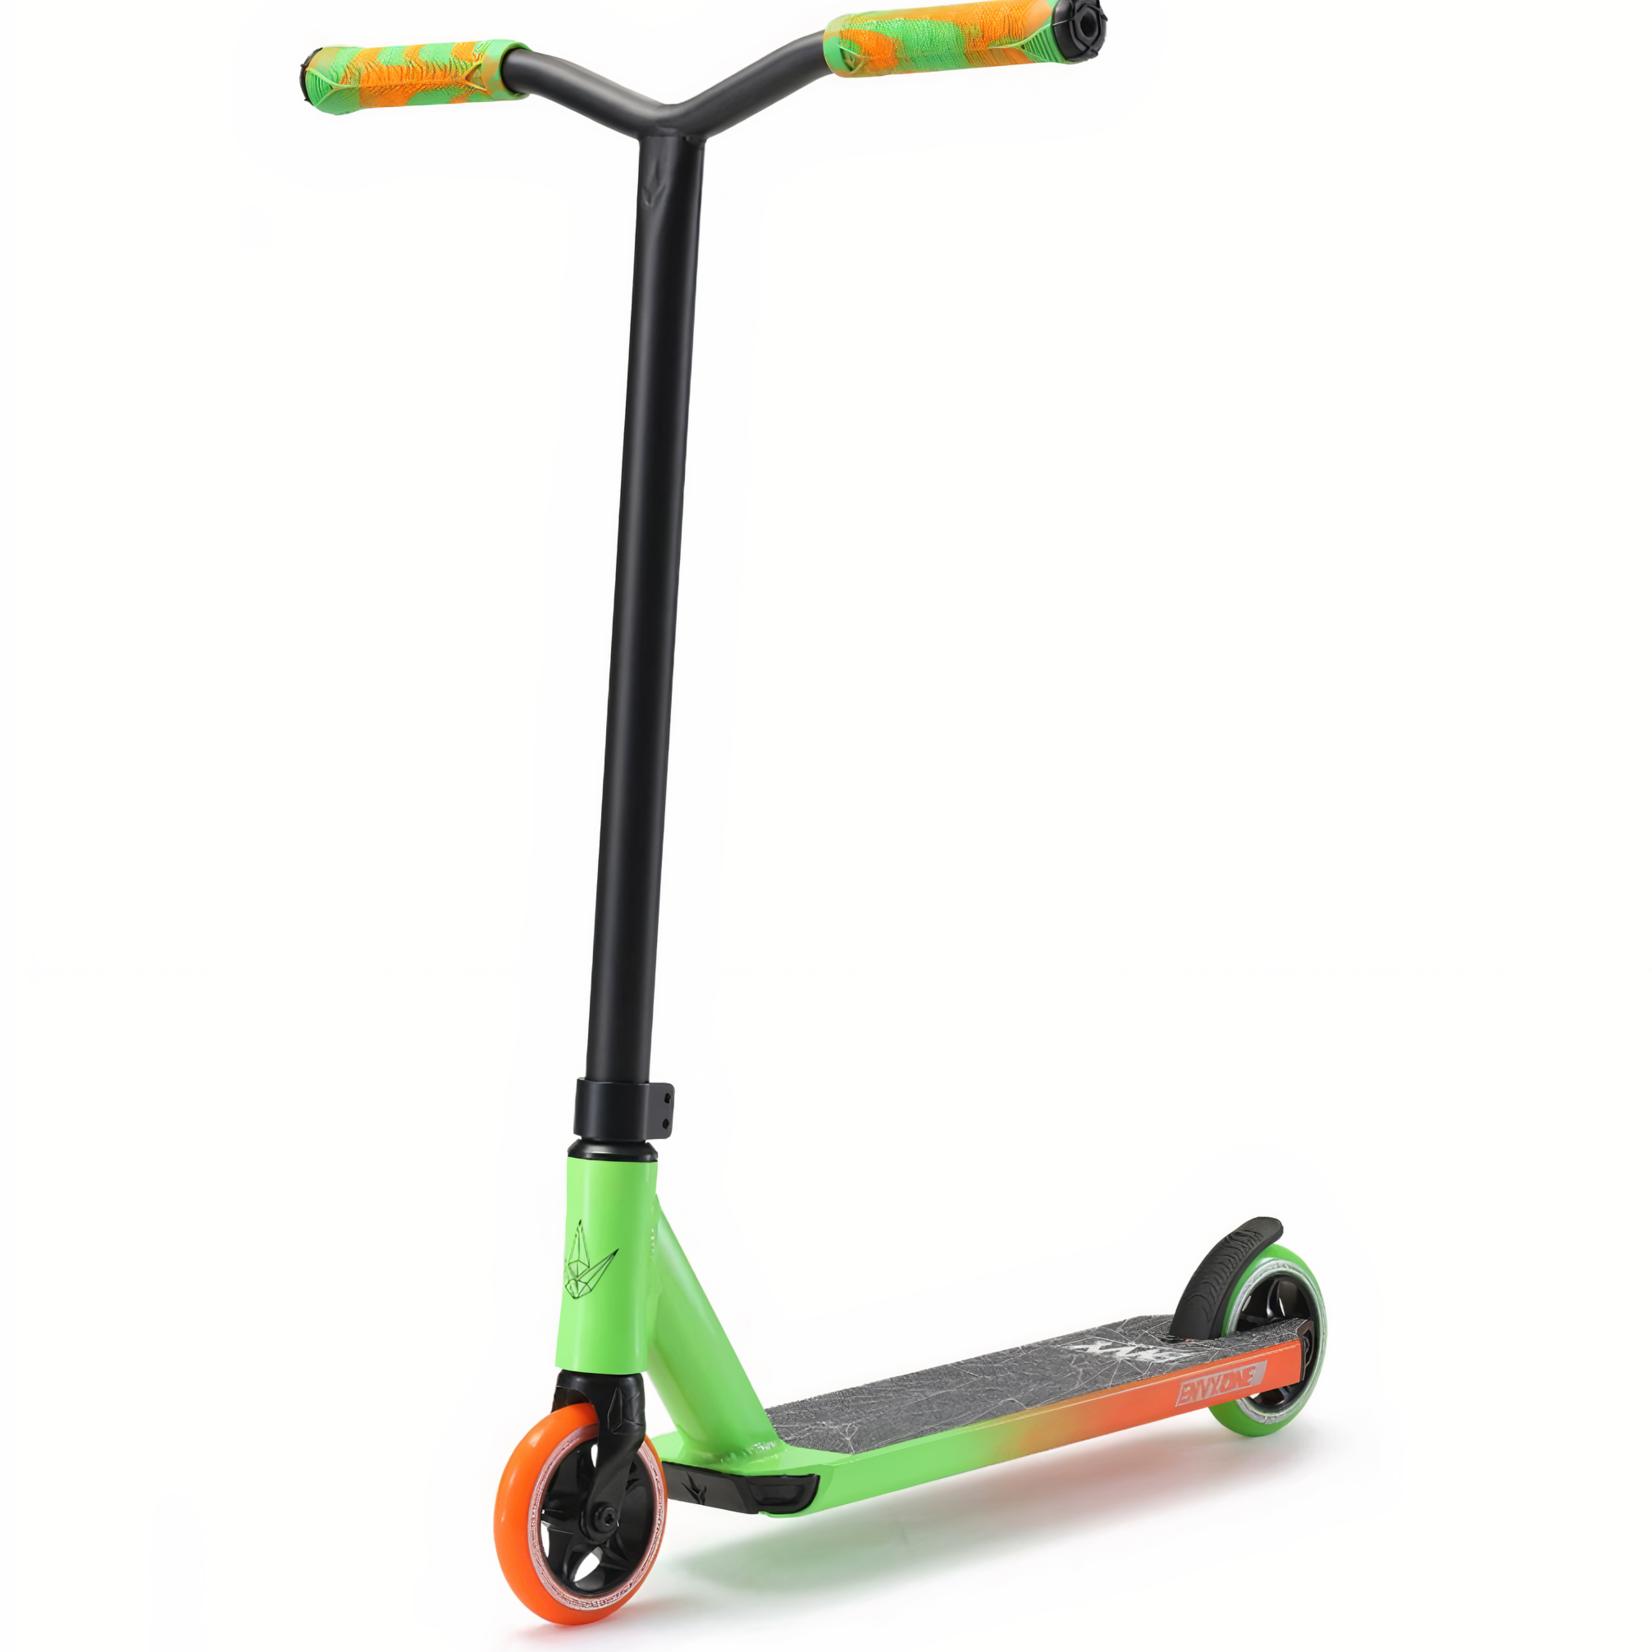 Envy Envy - One Complete S3 - Green / Orange